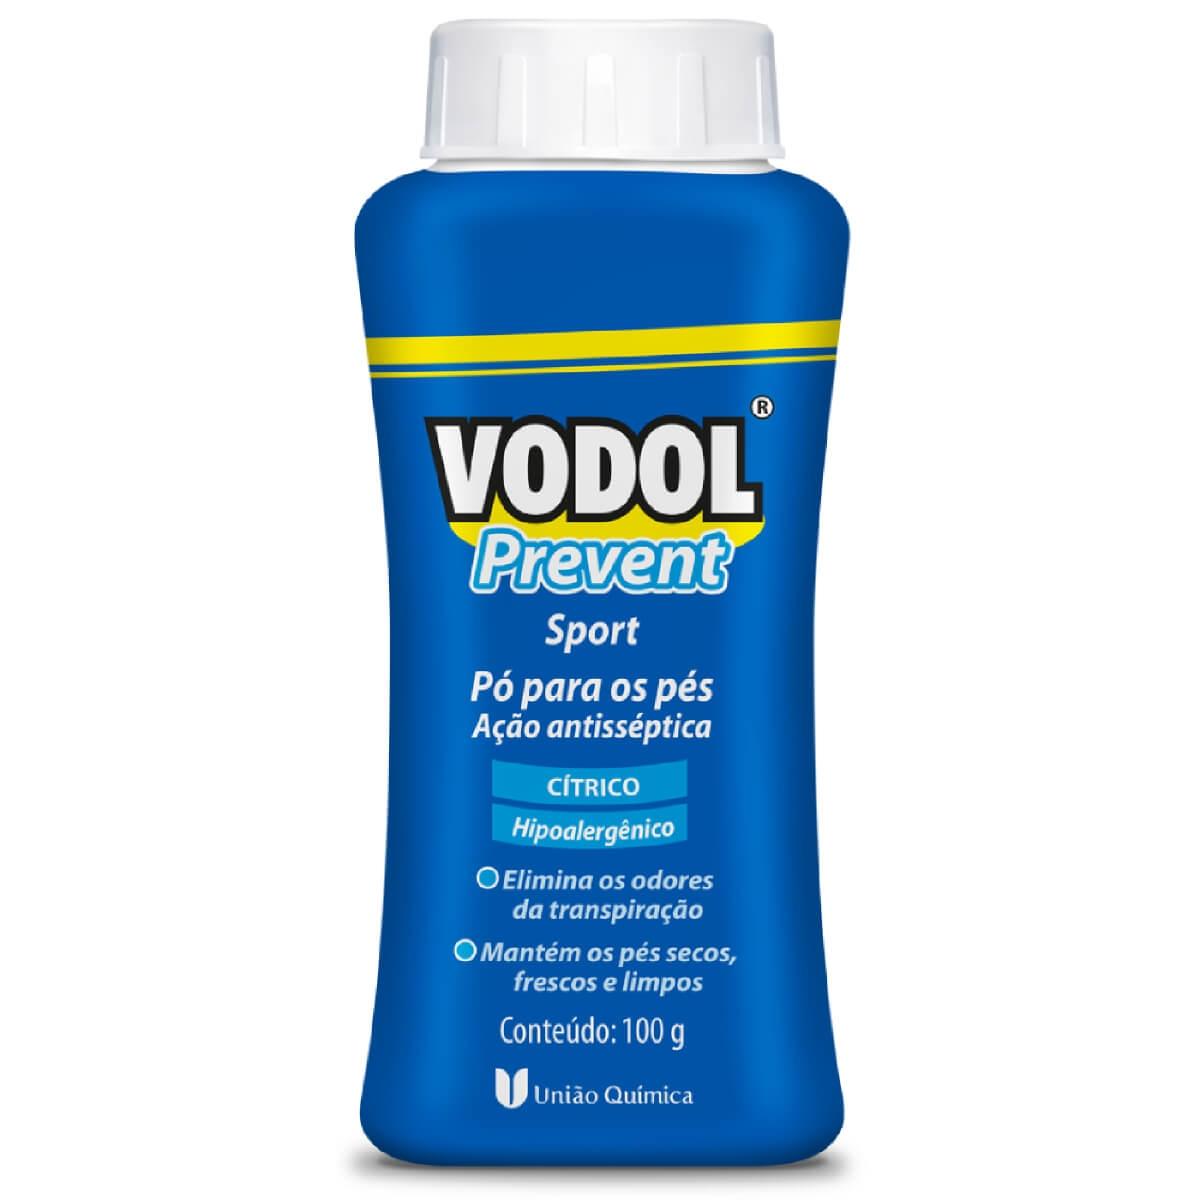 Pó para os Pés Vodol Prevent Sport 100g 100g